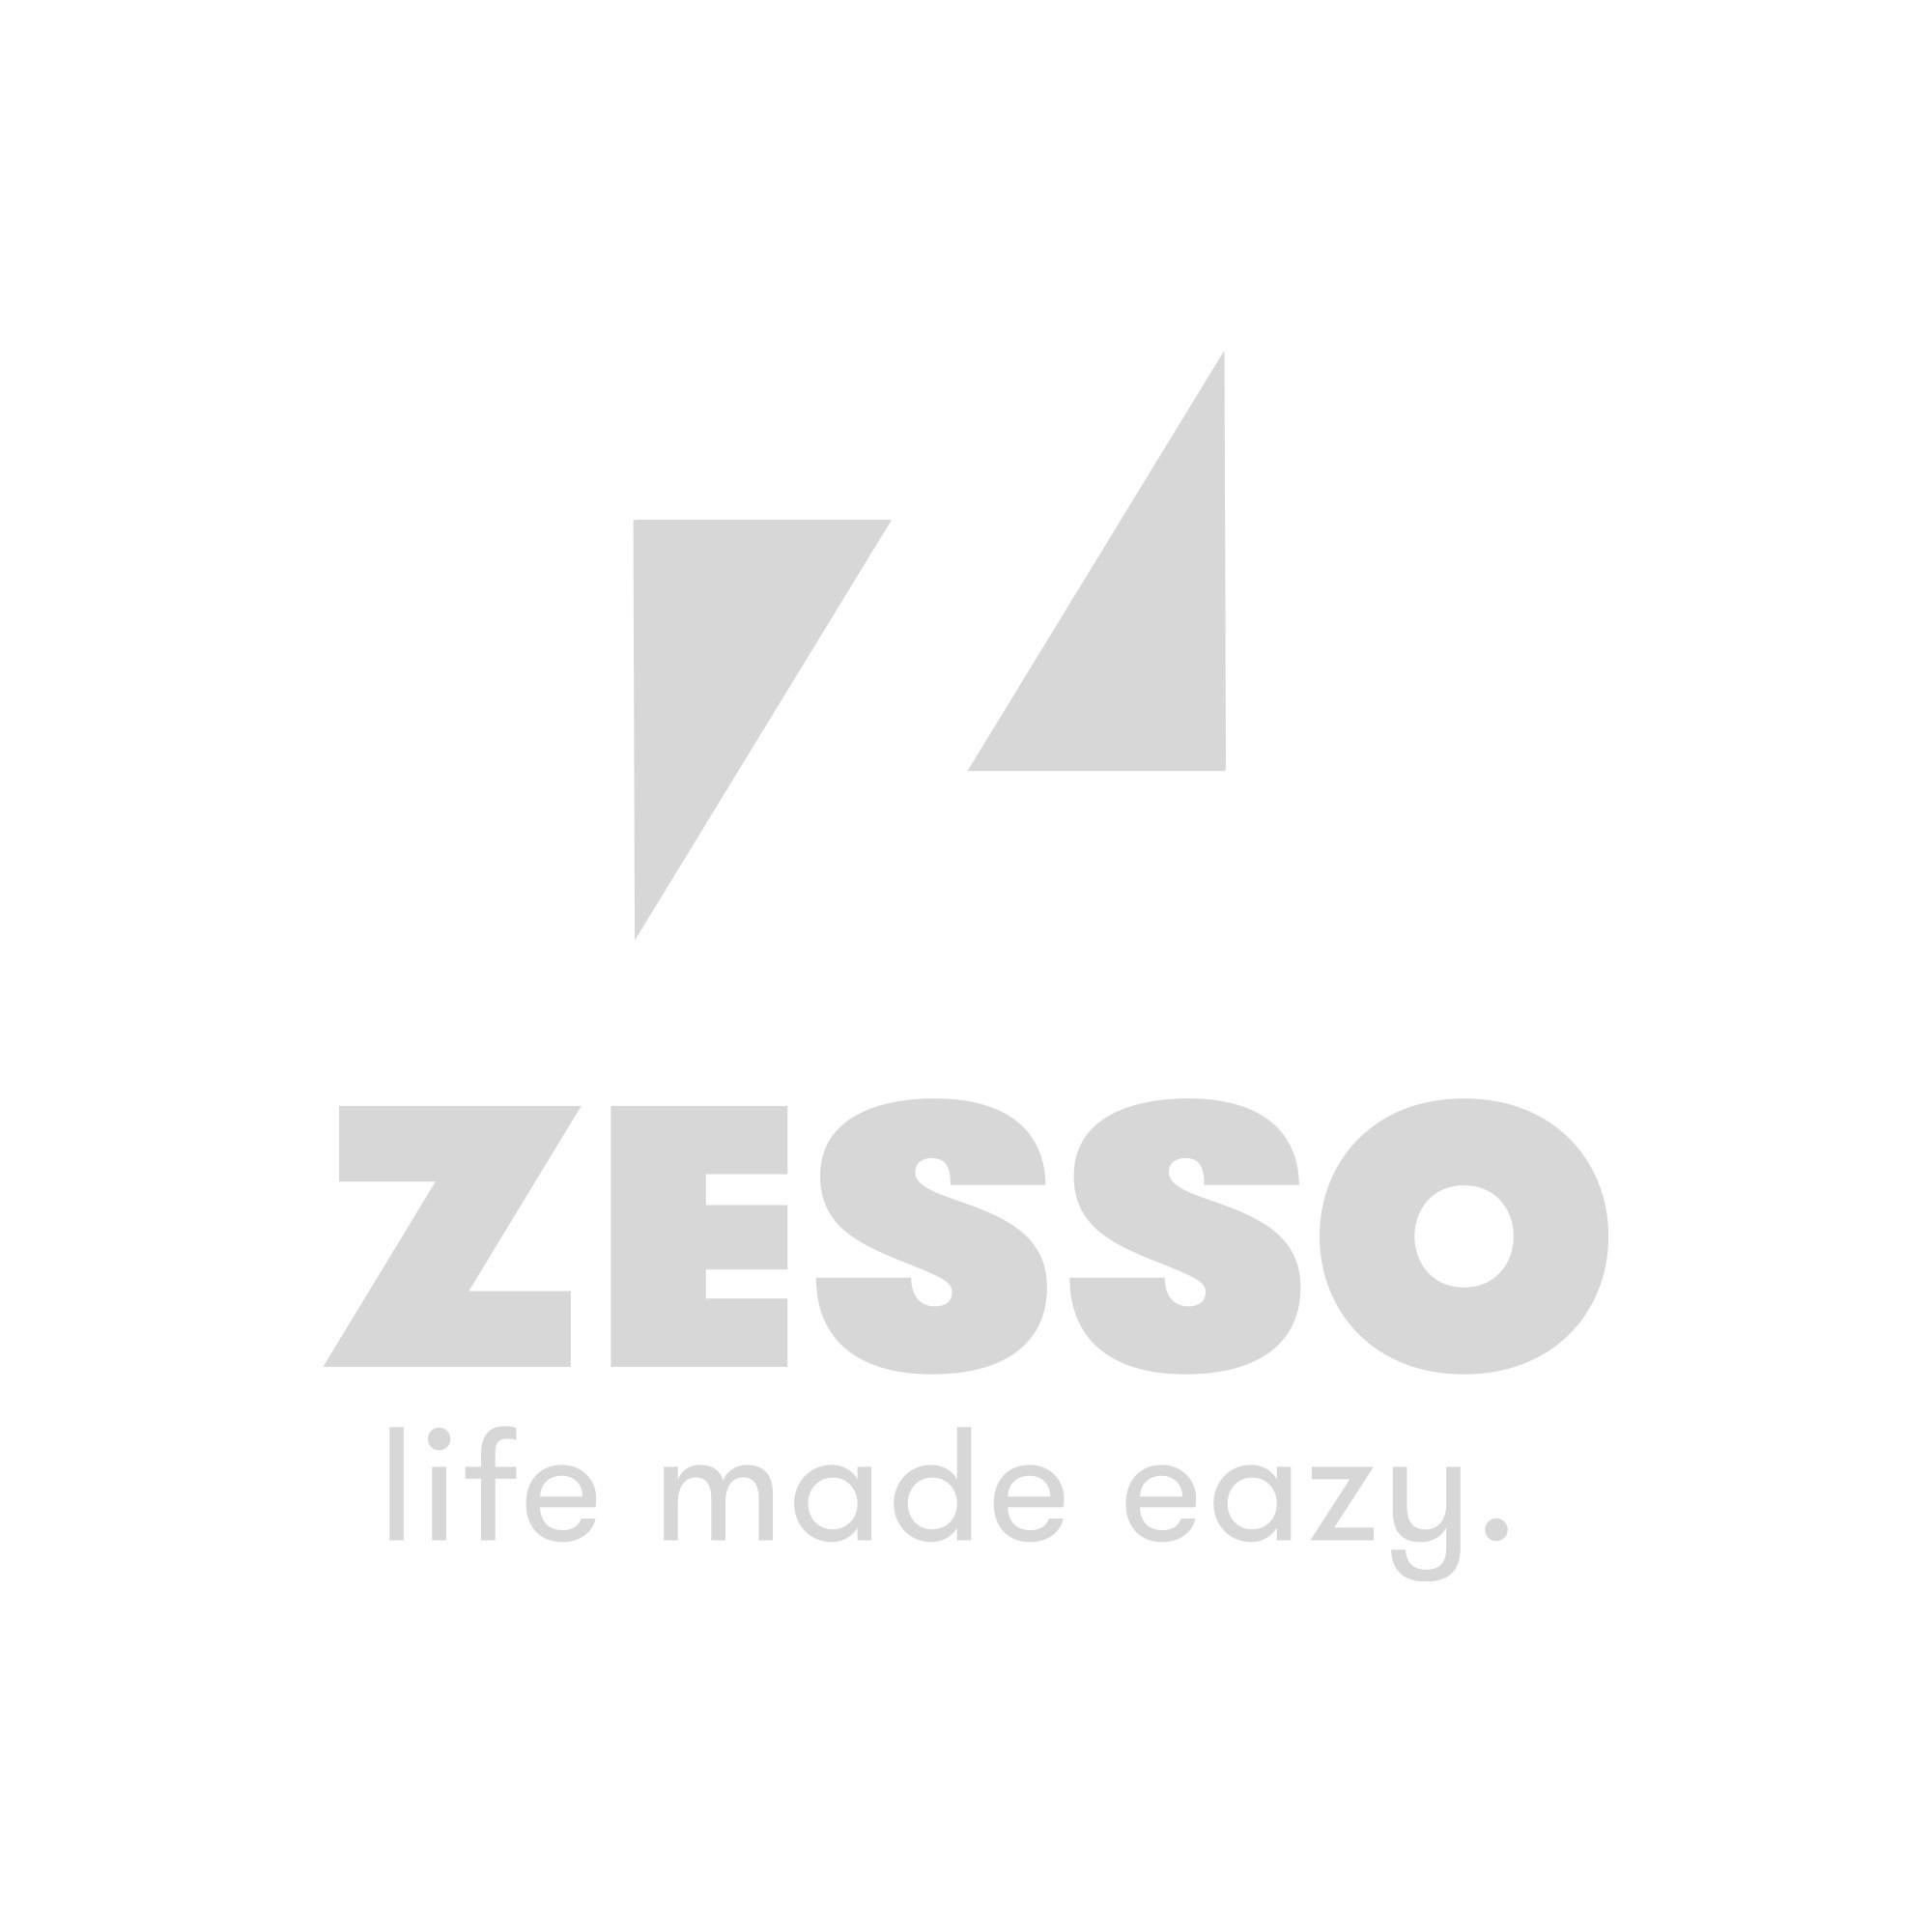 Kleine Wolke Douchegordijn Sonny Antraciet - 180 cm x 200 cm